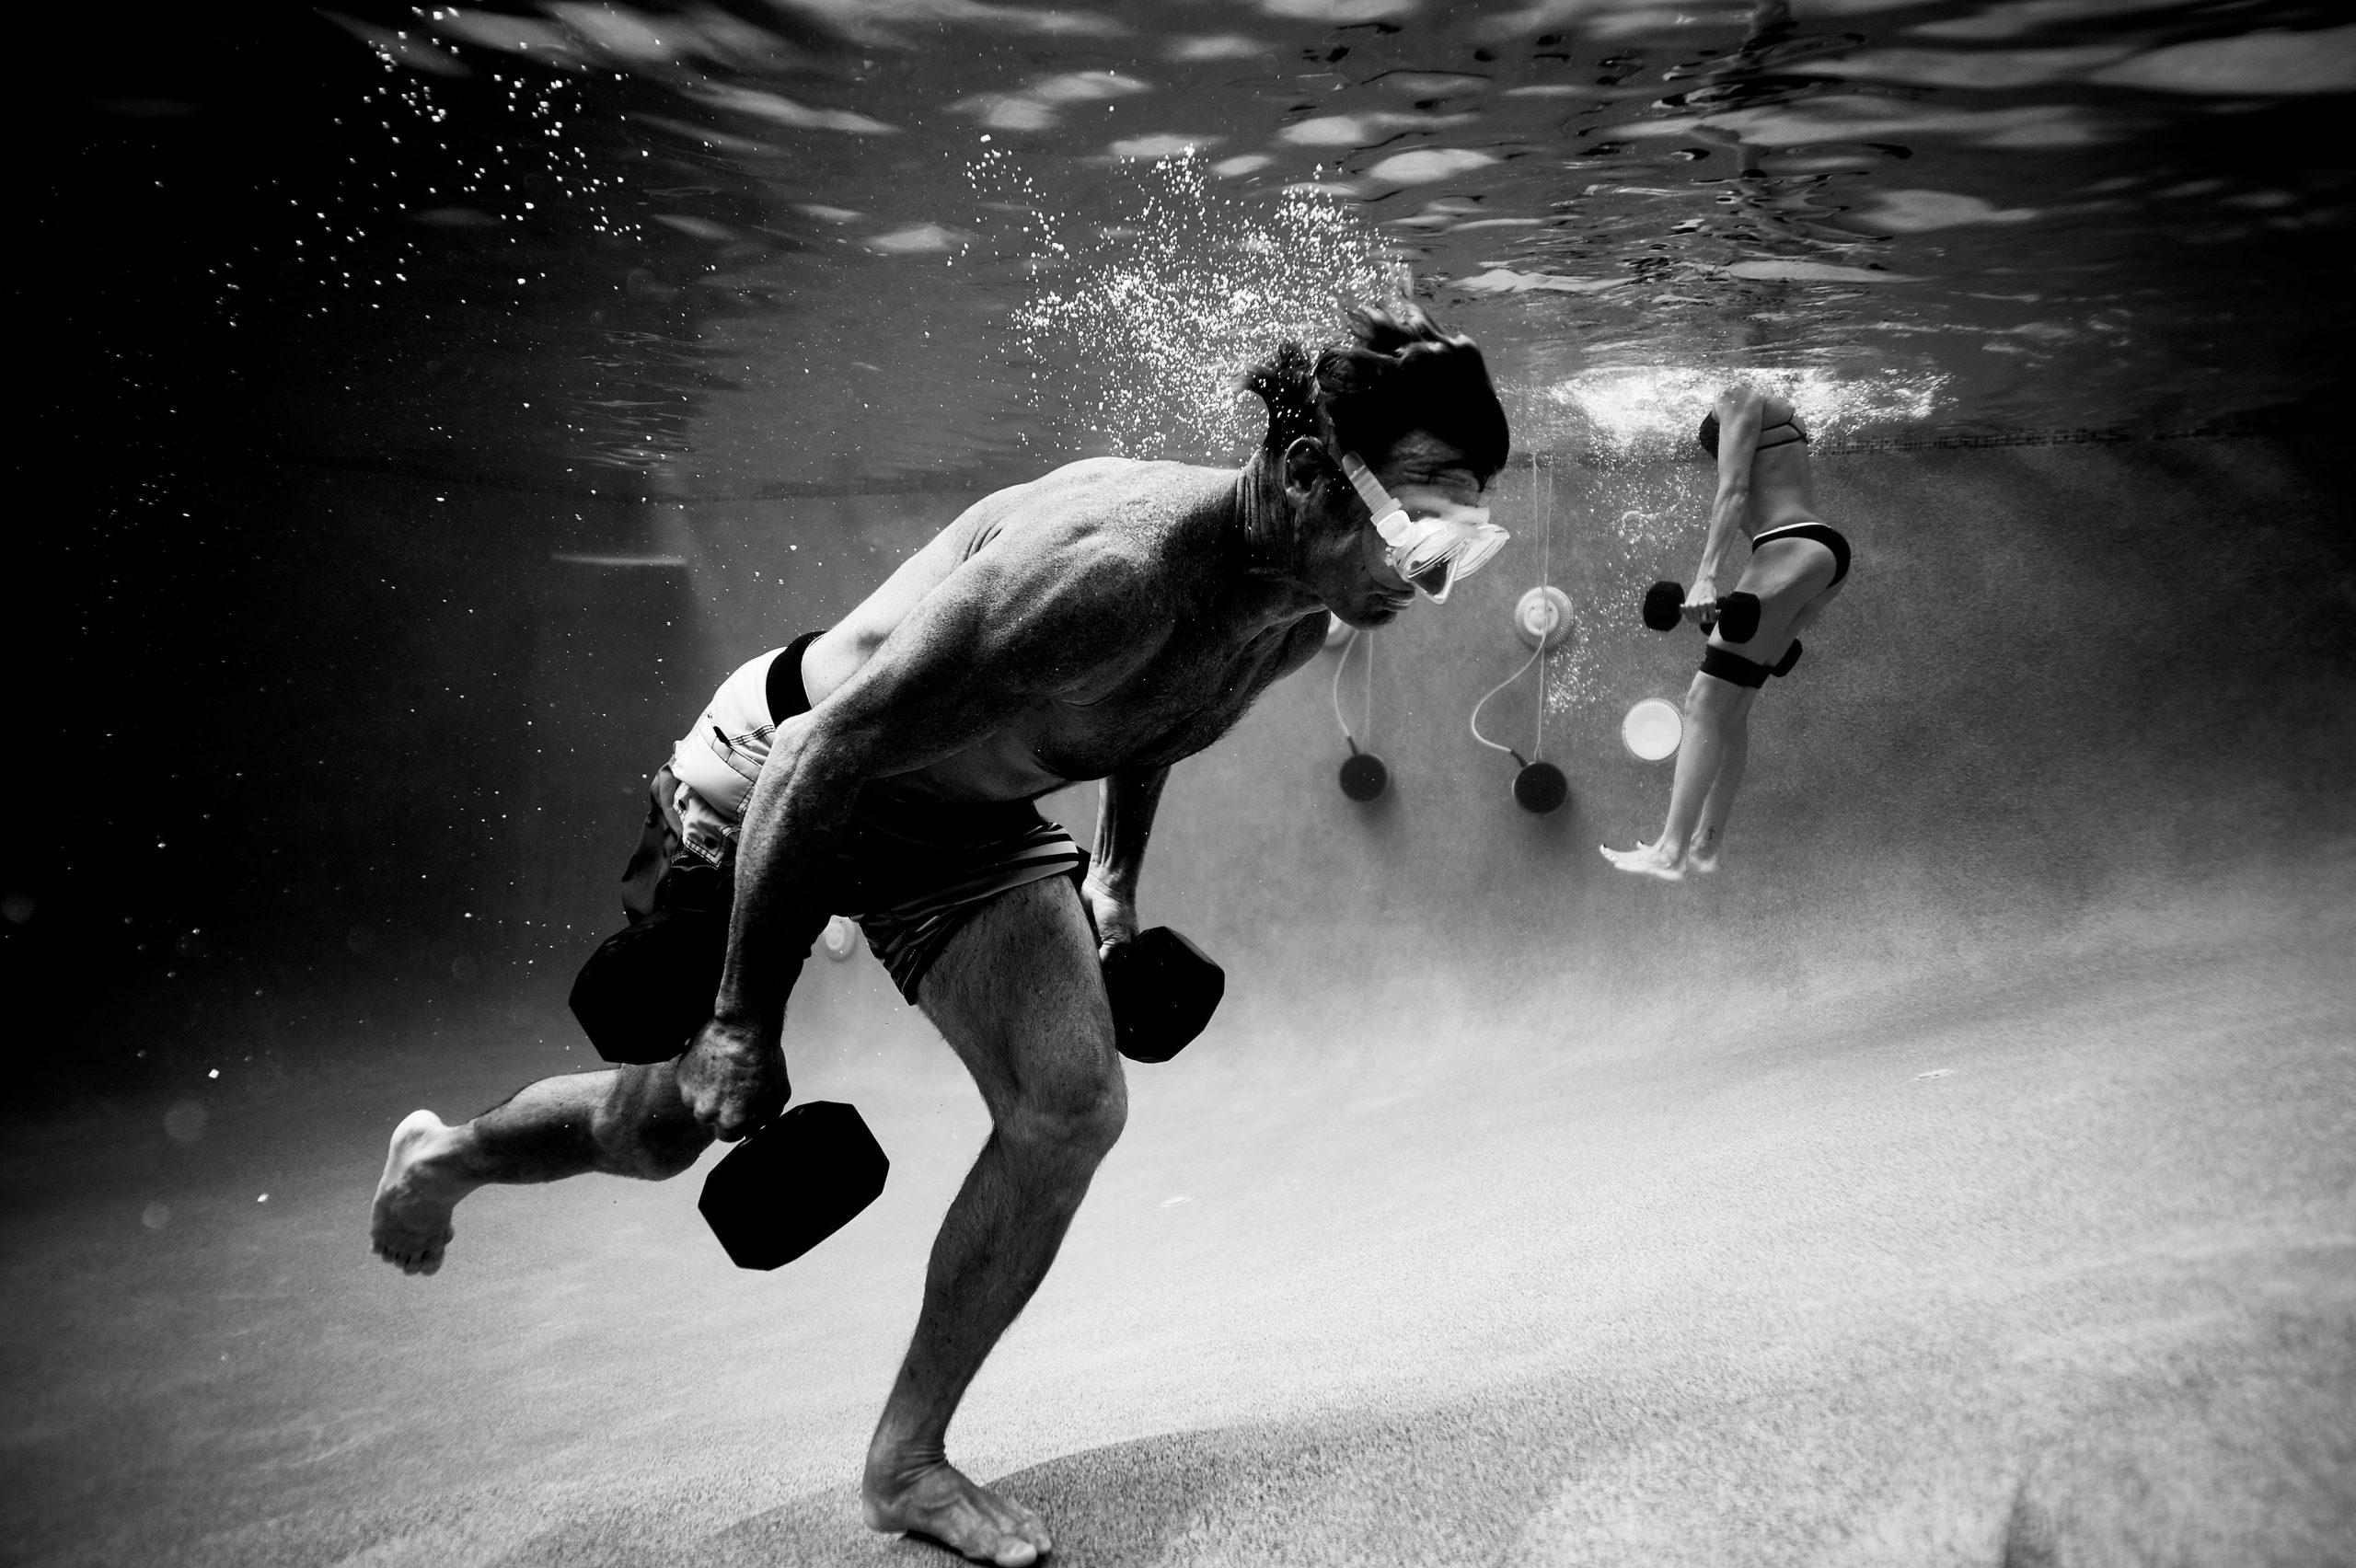 Scott Carney running underwater while carrying dumbbells